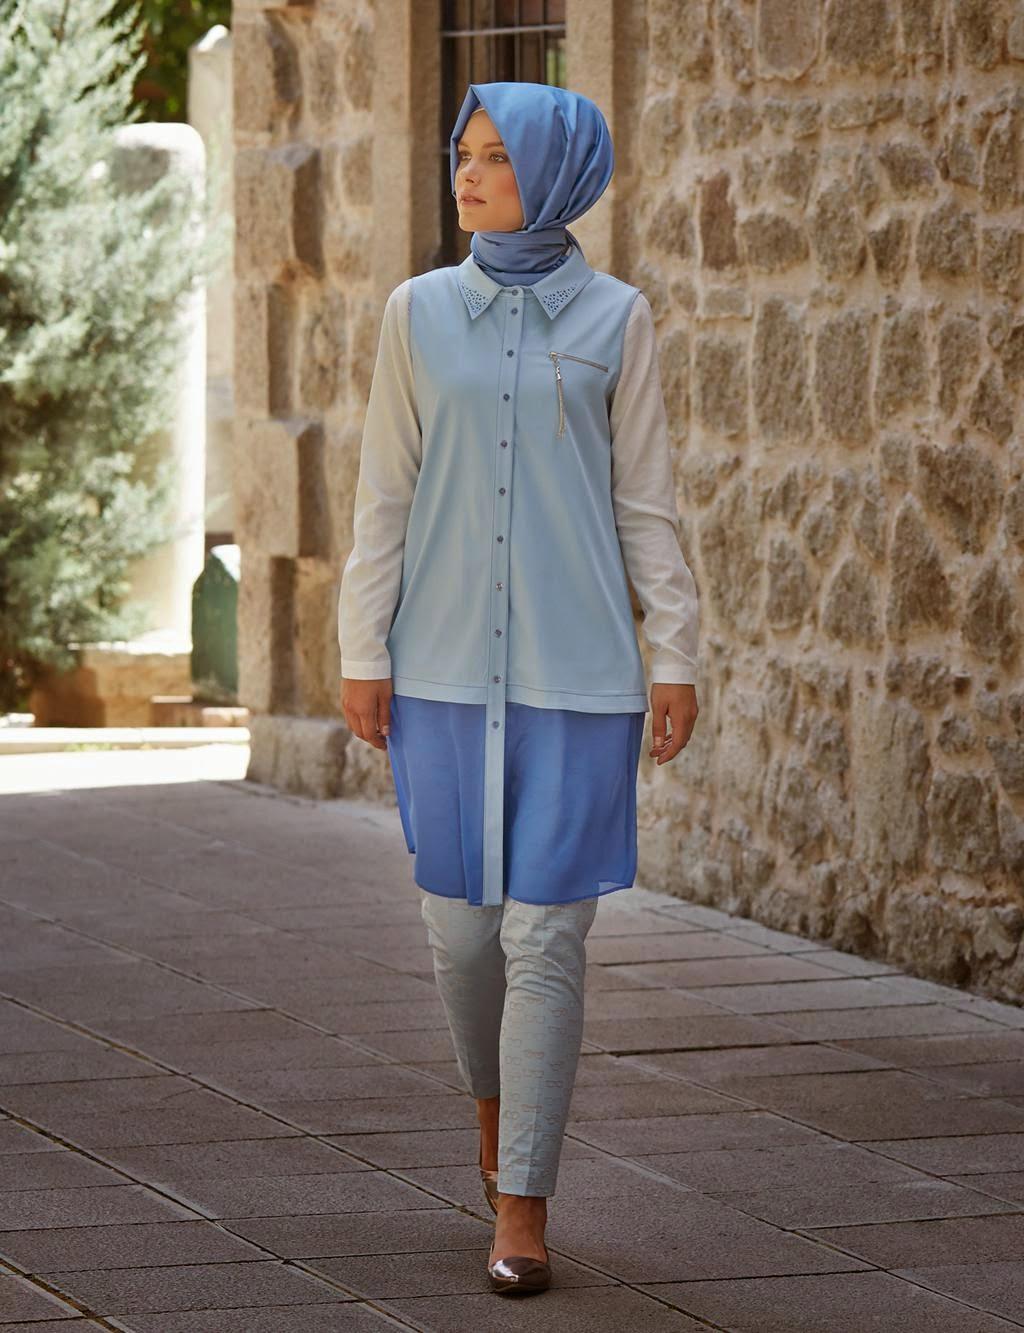 hijab-moderne-2015-image1